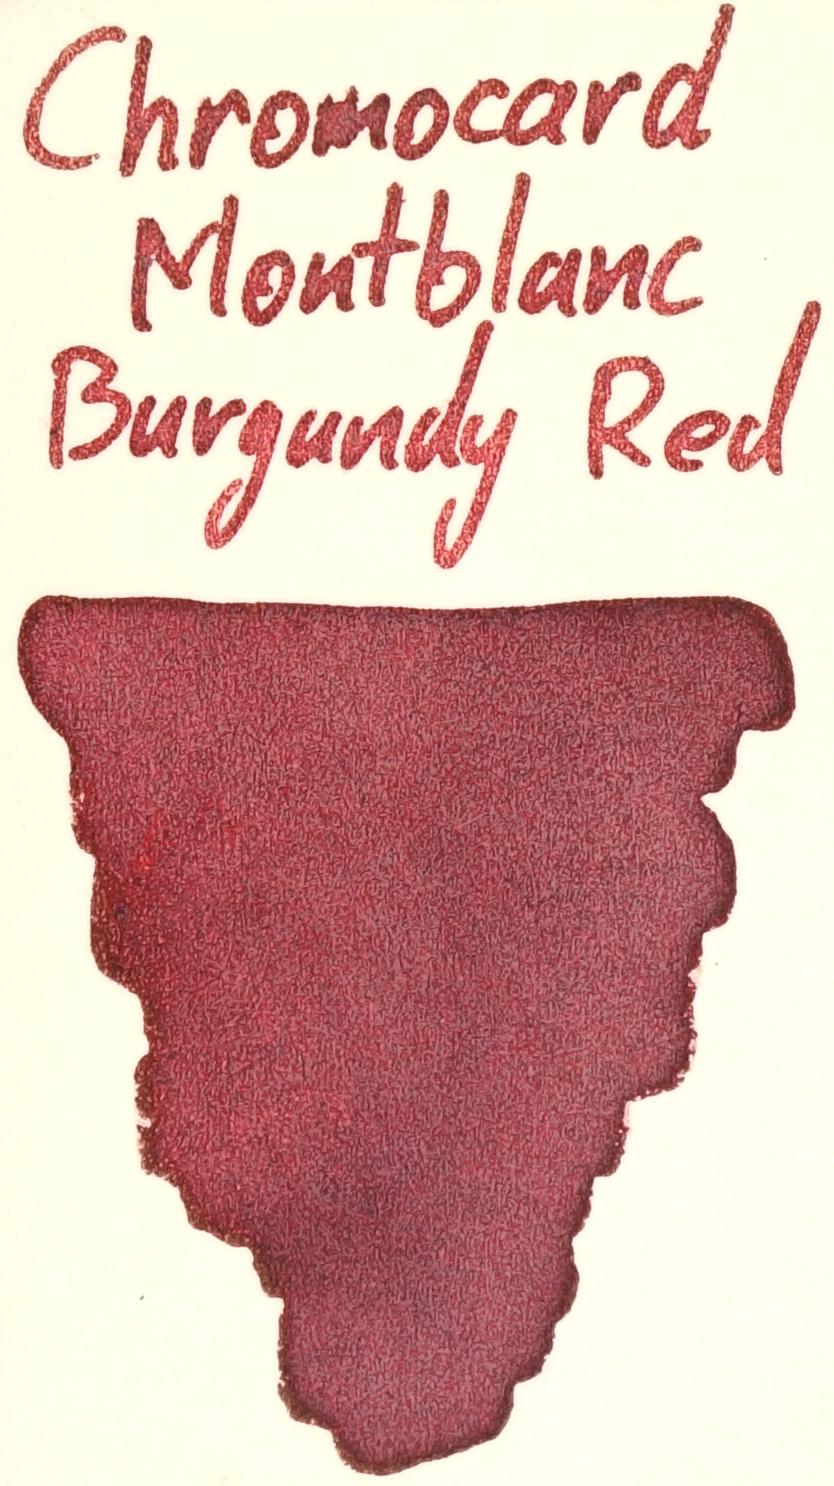 Montblanc Burgundy Red Chromocard.JPG